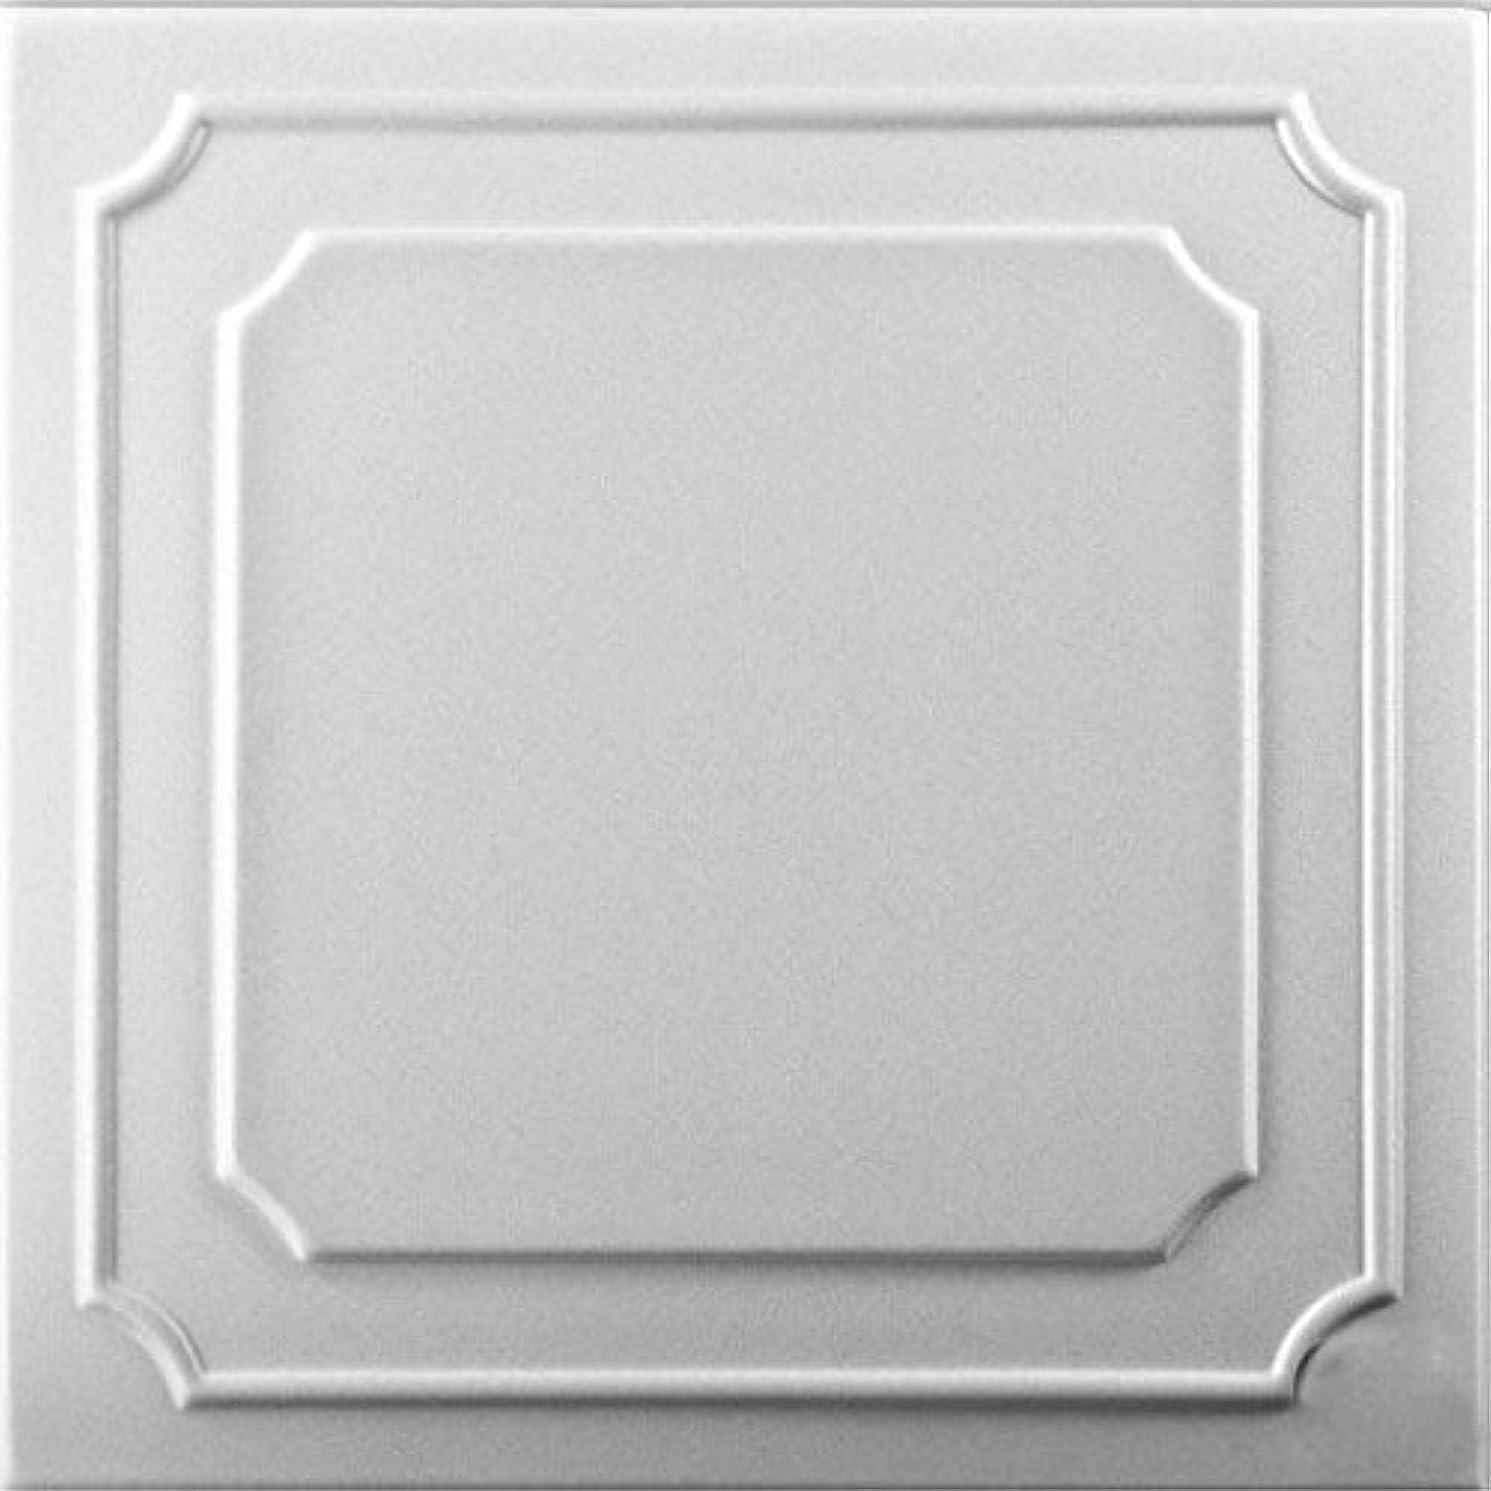 A la Maison Ceilings 802 Styrofoam Ceiling Tile (Package of 8 Tiles), Plain White